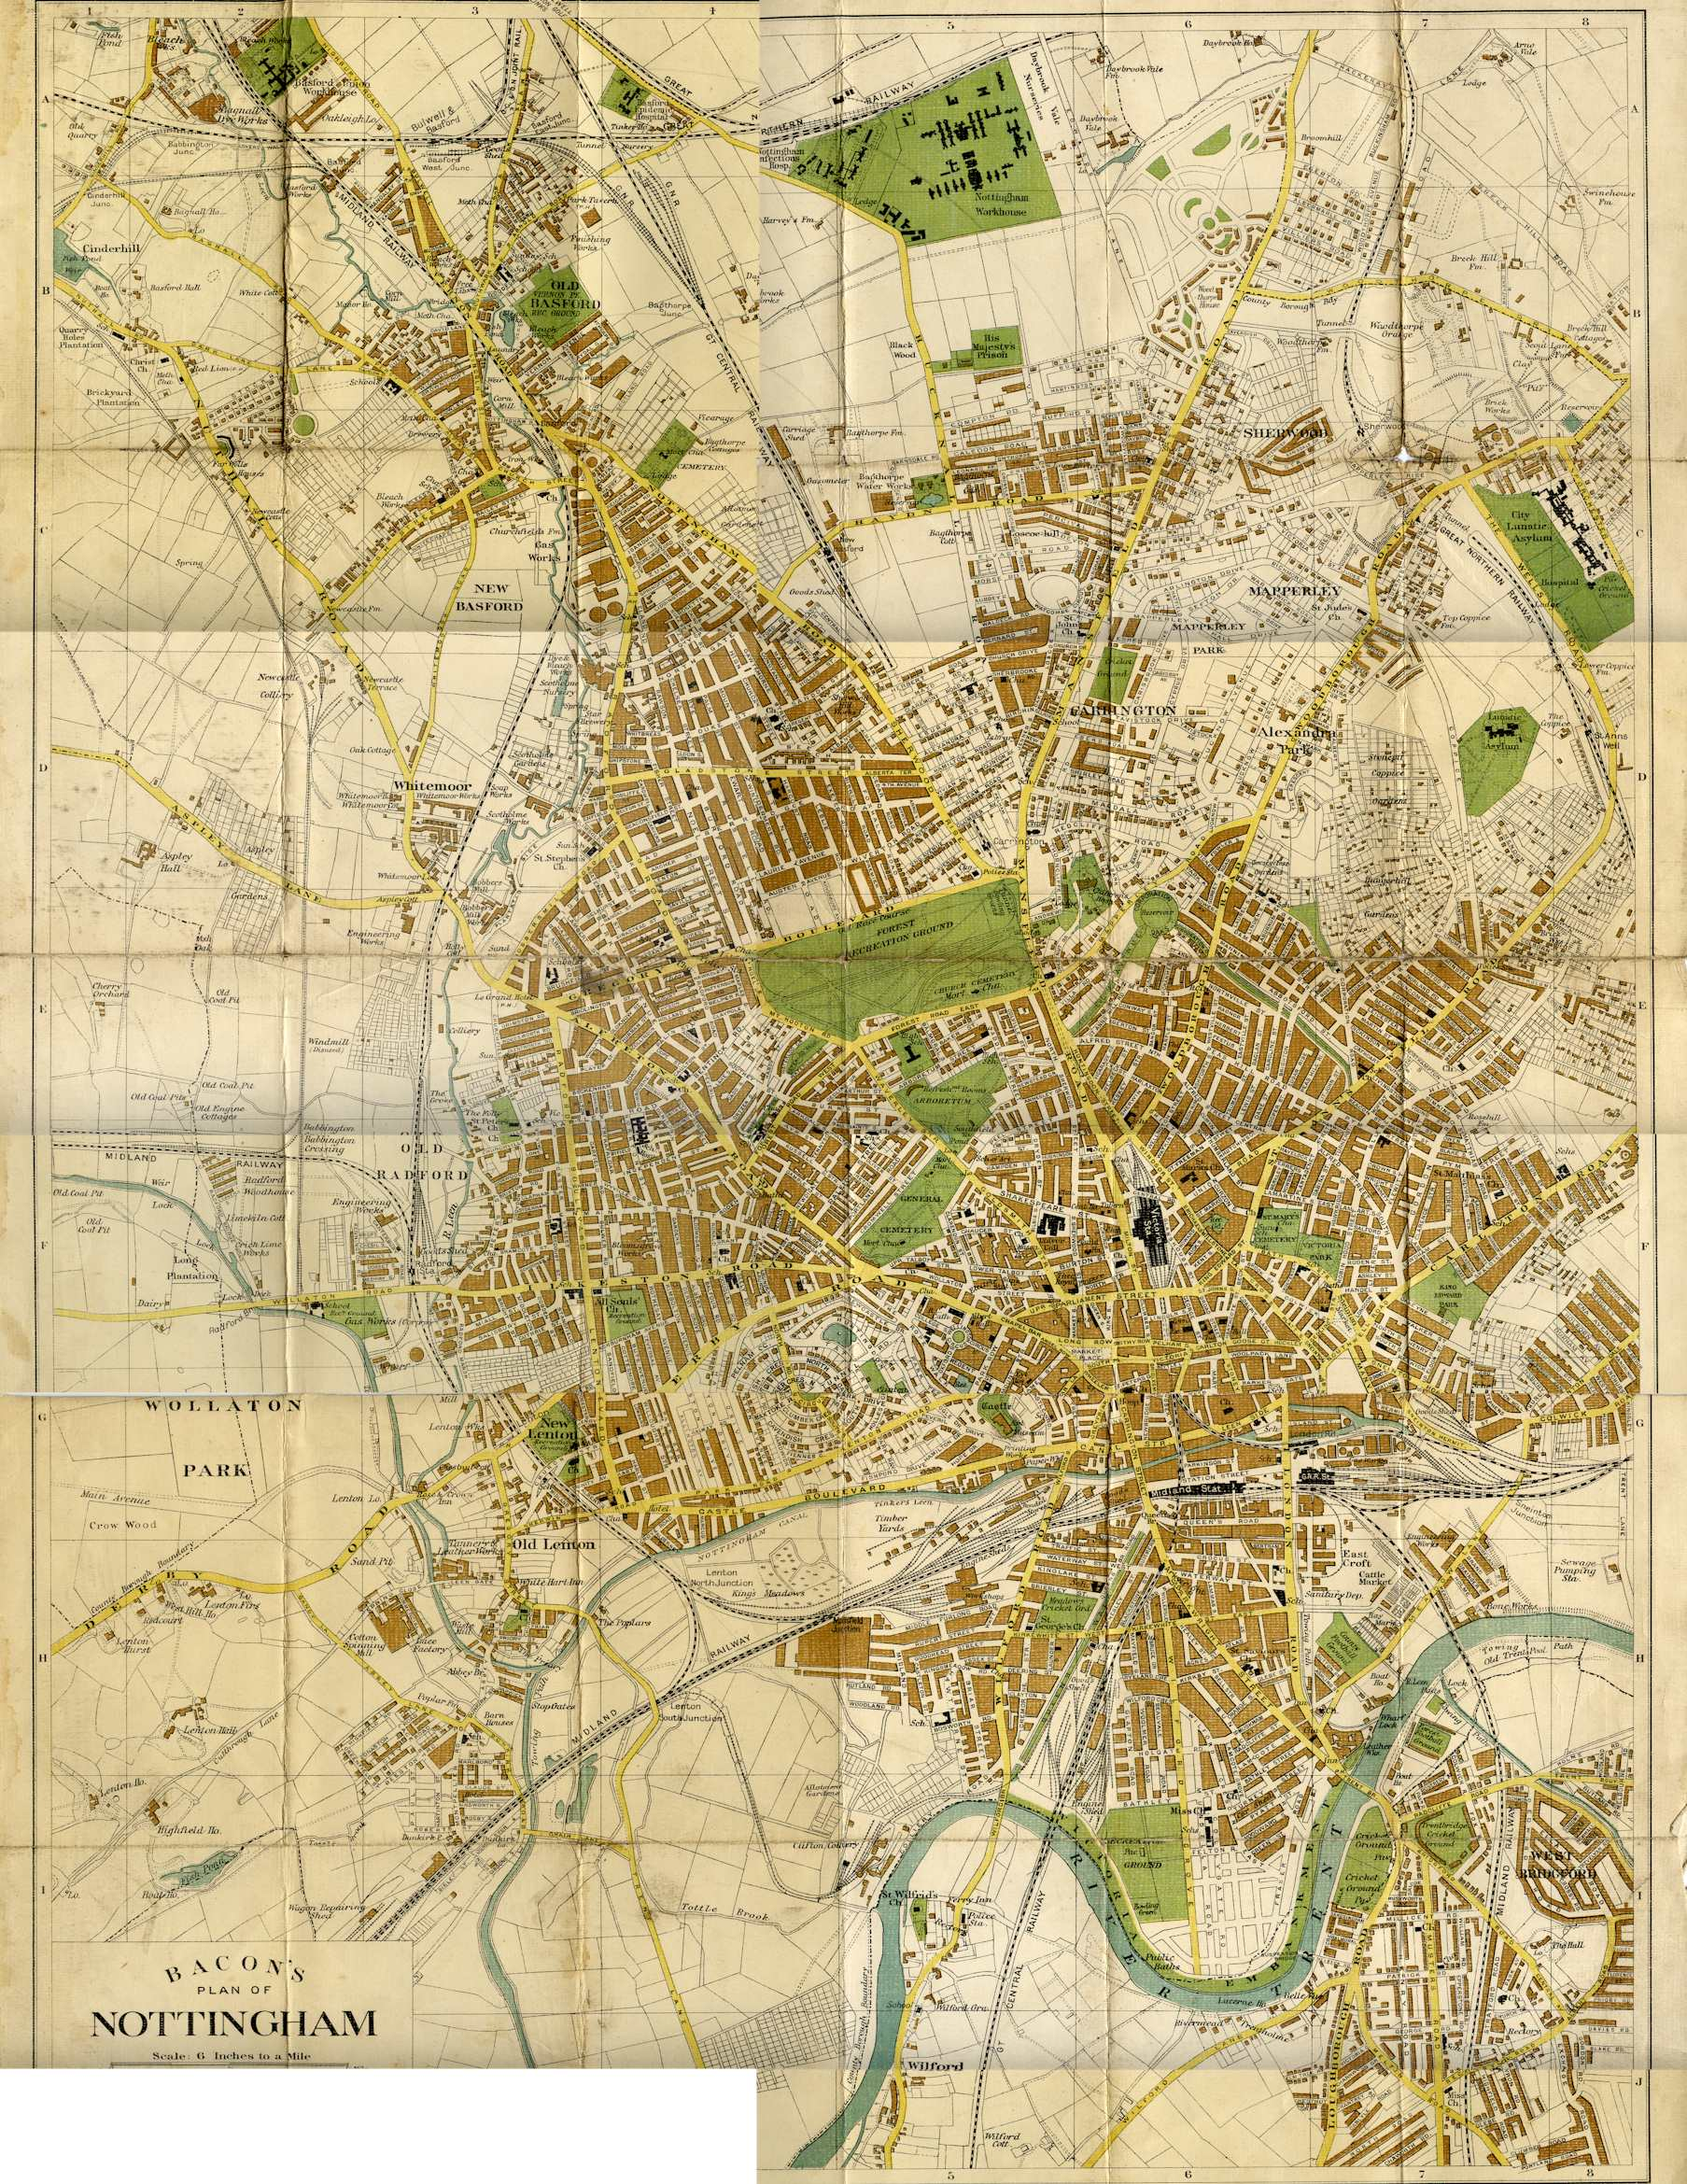 nottingham 1920s old maps of nottingham nottstalgia. Black Bedroom Furniture Sets. Home Design Ideas